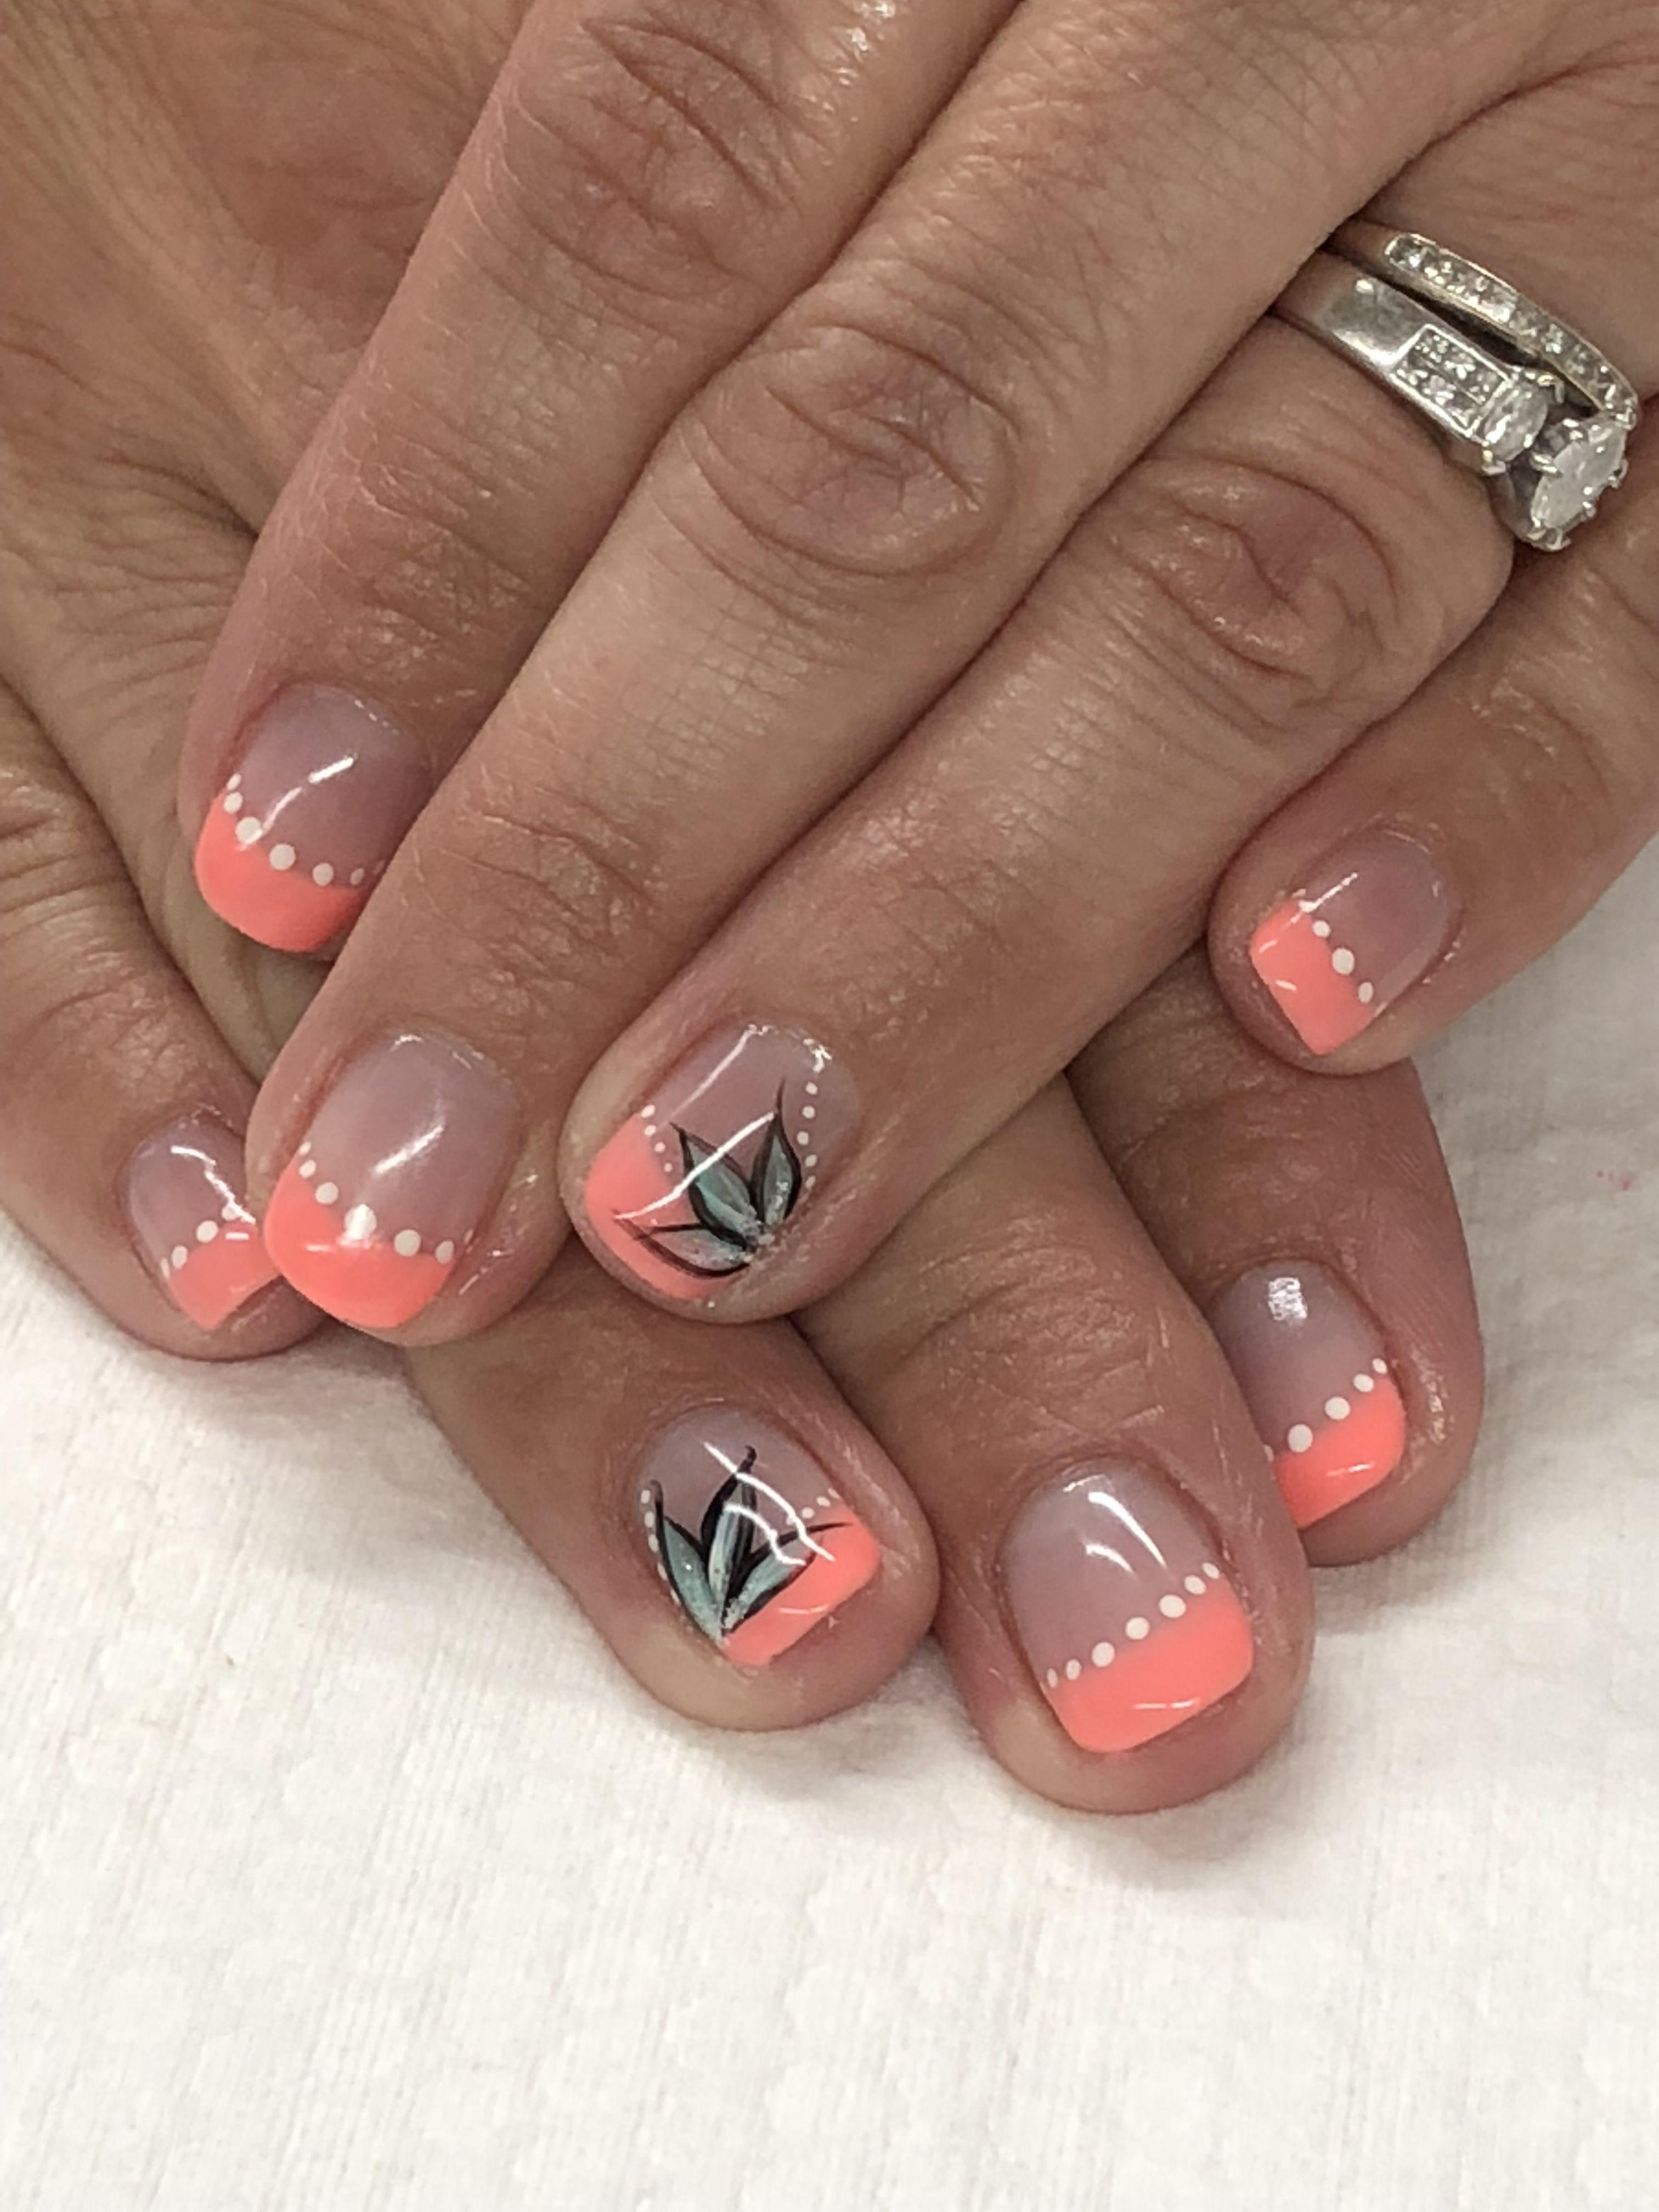 Coral Tropical Summer French Gel Nails Summer Gel Nails Gel